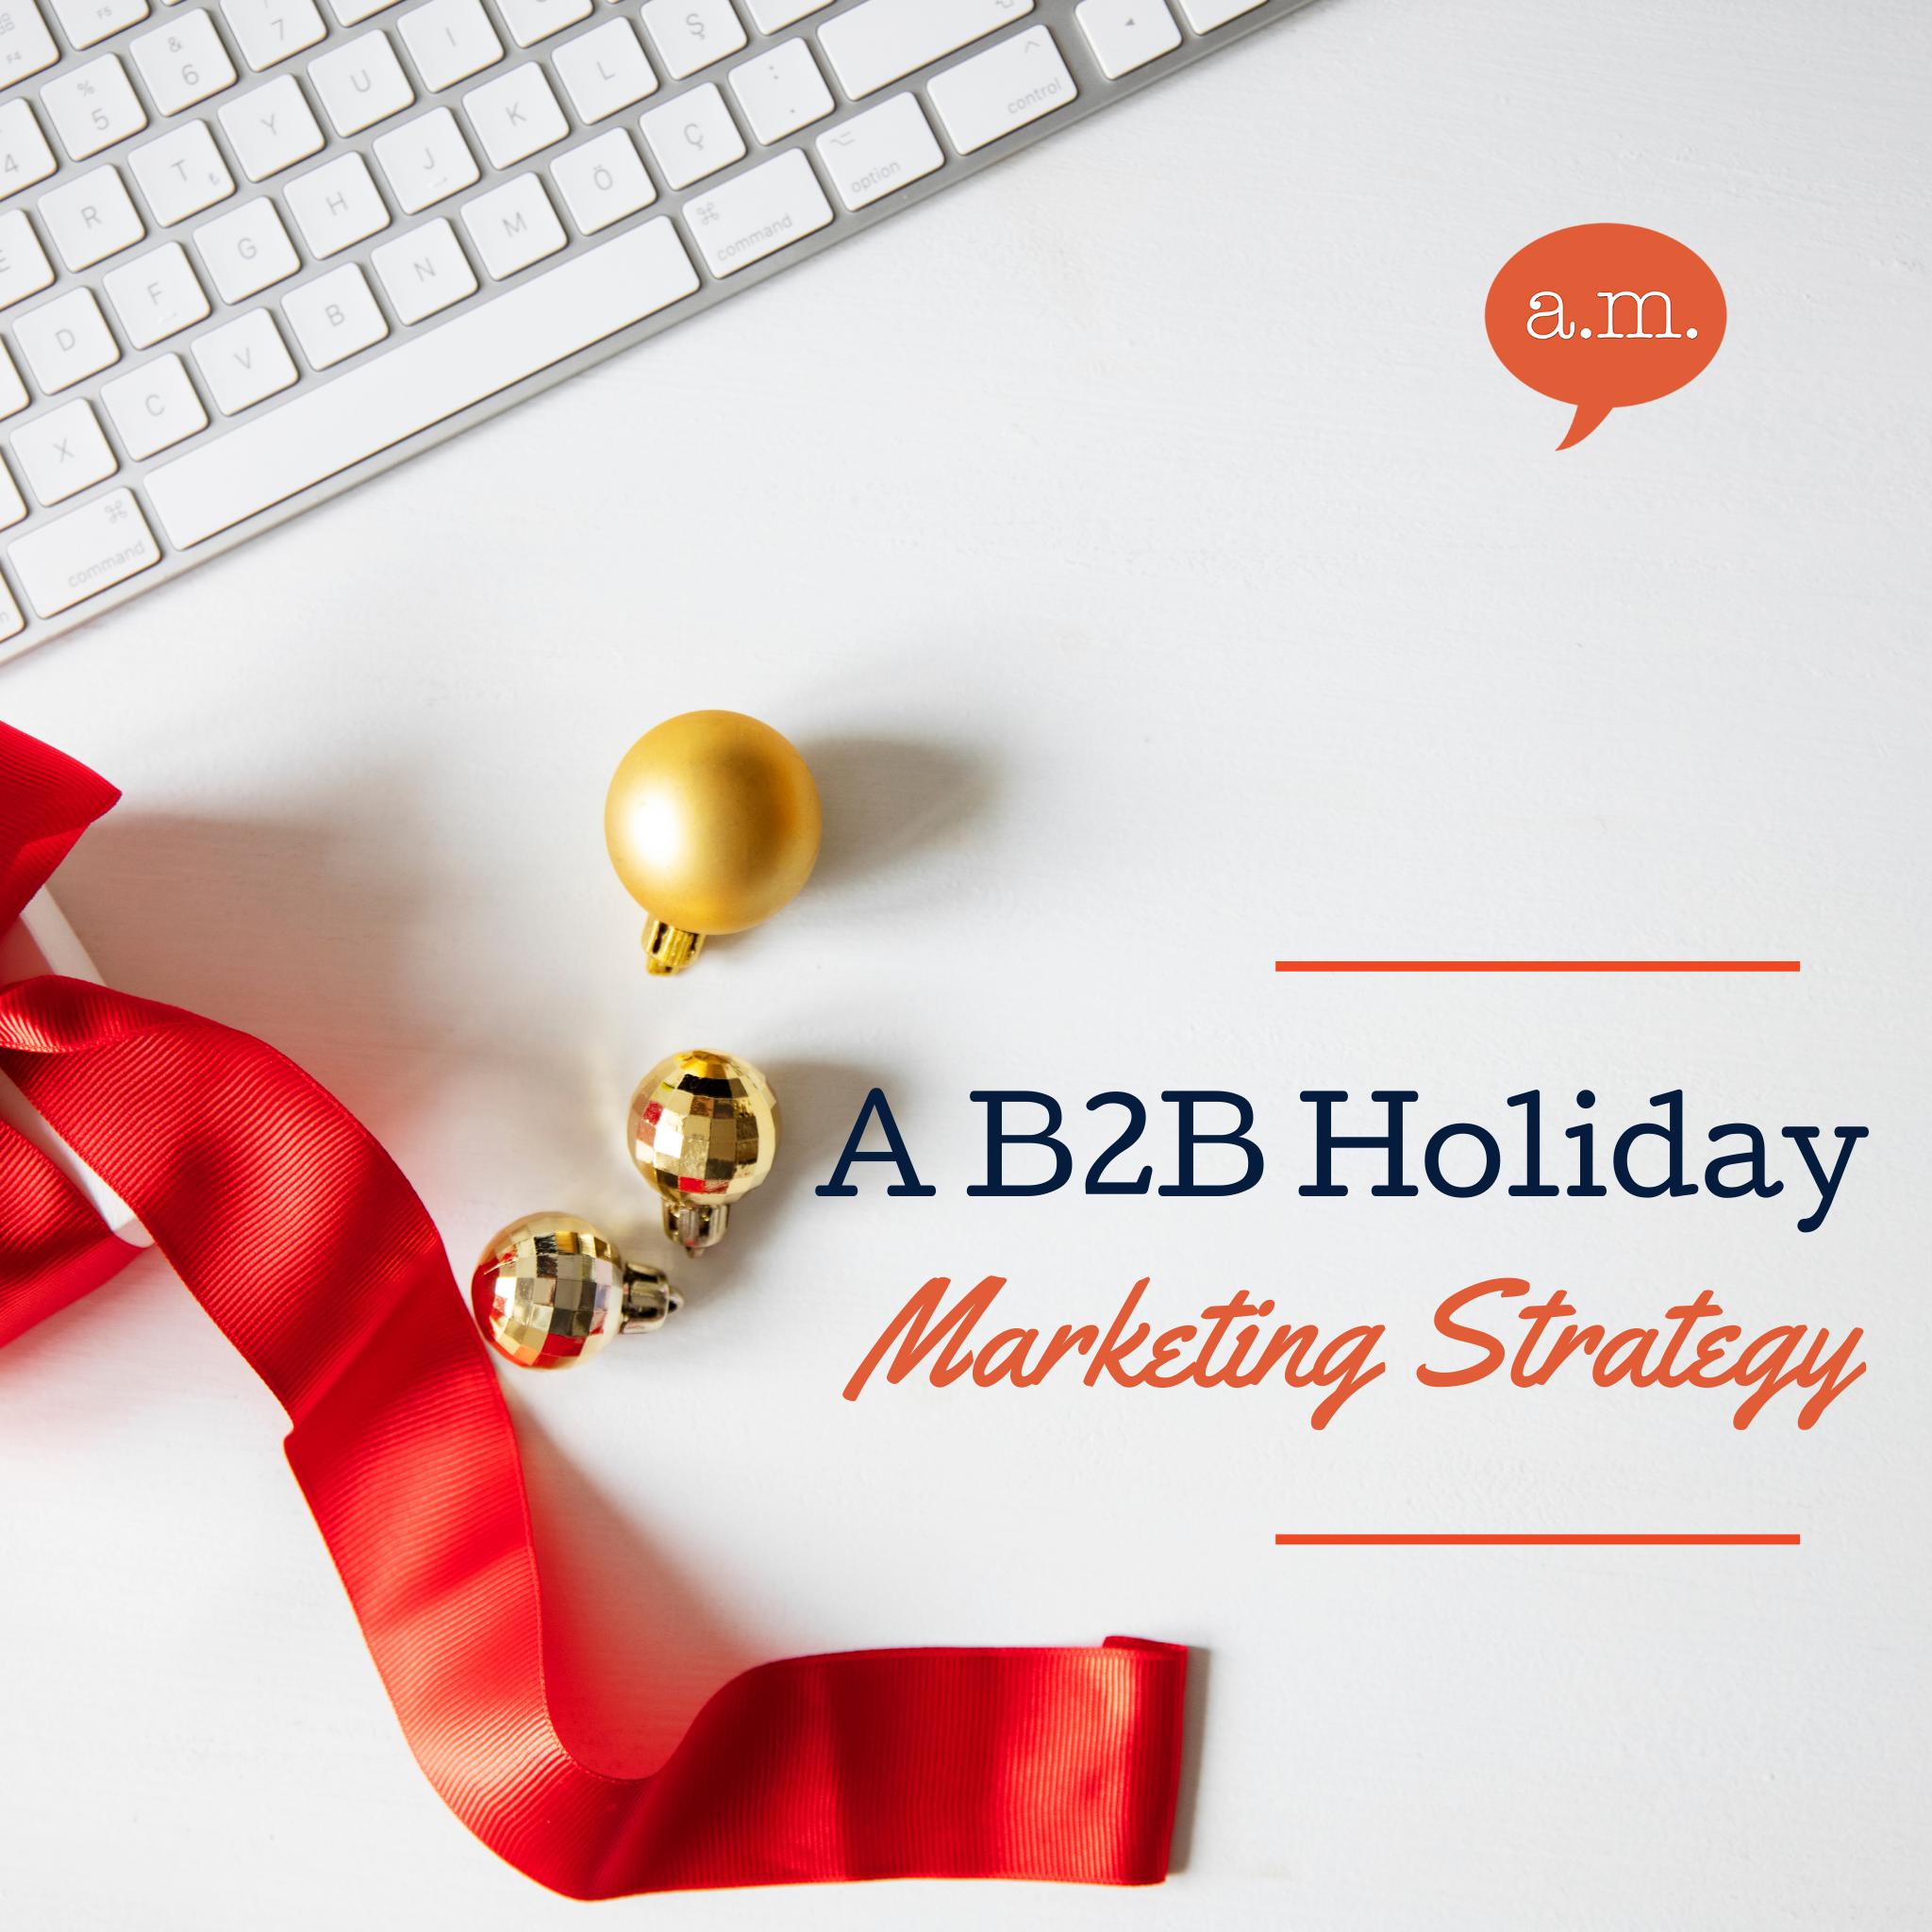 A B2B Holiday Marketing Strategy